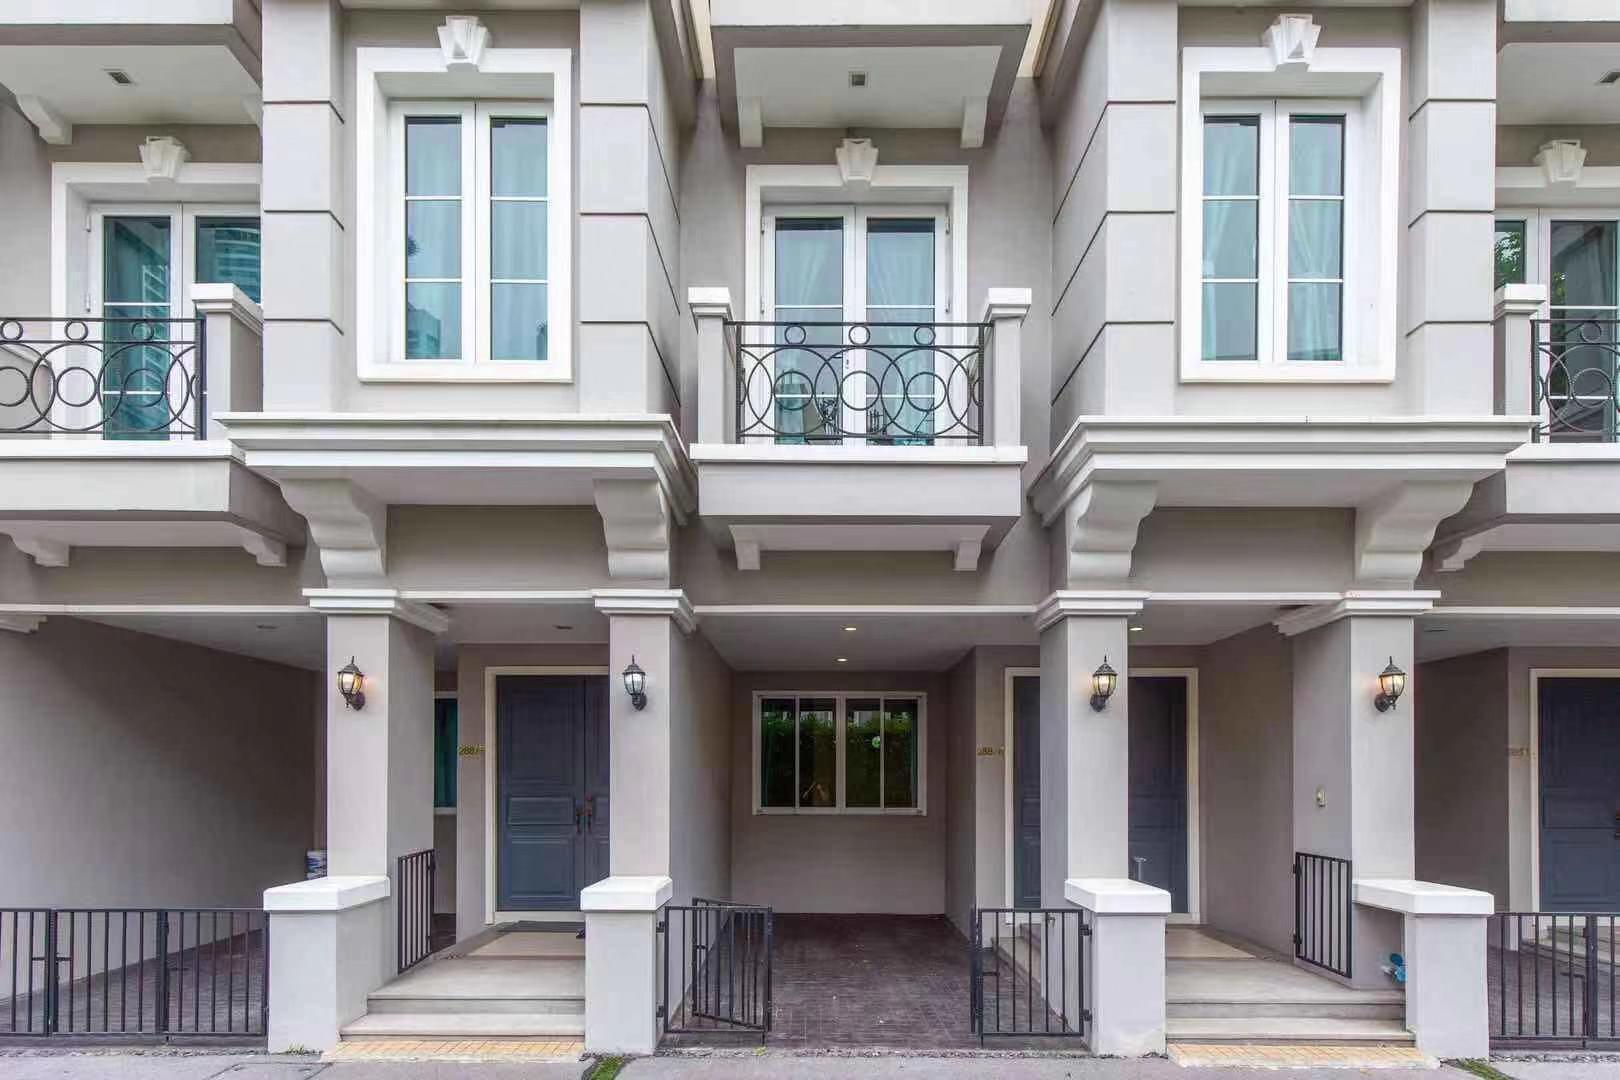 asok perfect home .perfect choice วิลลา 3 ห้องนอน 4 ห้องน้ำส่วนตัว ขนาด 240 ตร.ม. – สุขุมวิท